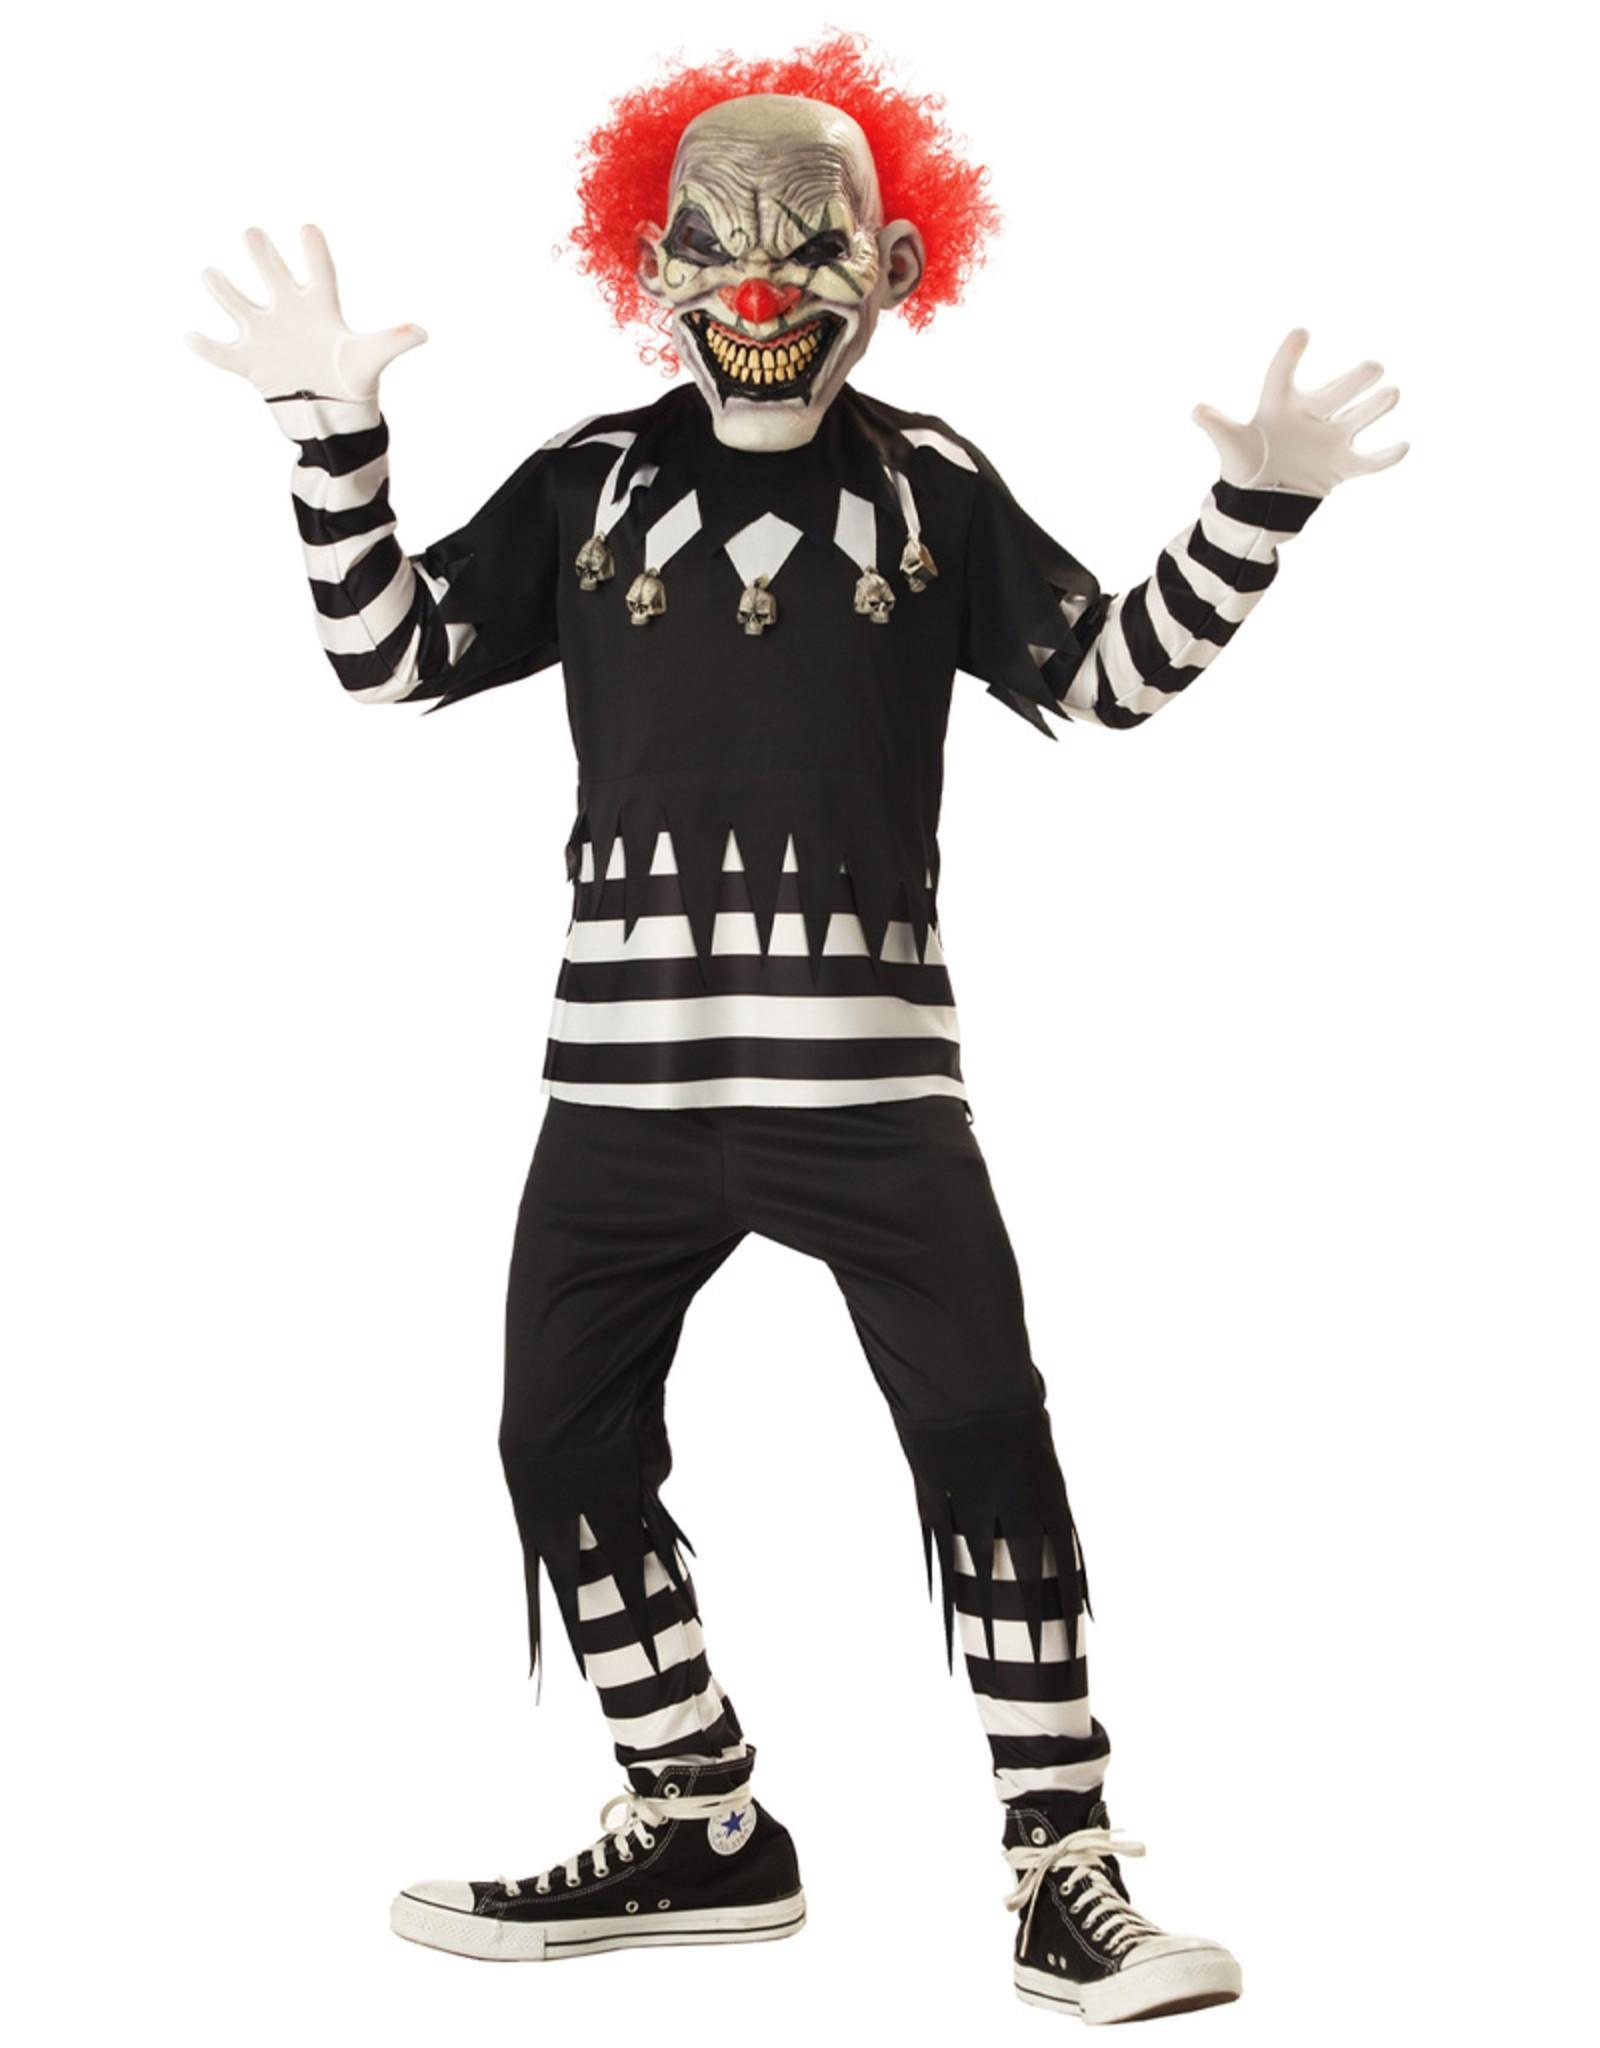 Creepy Clown Costume - Boys